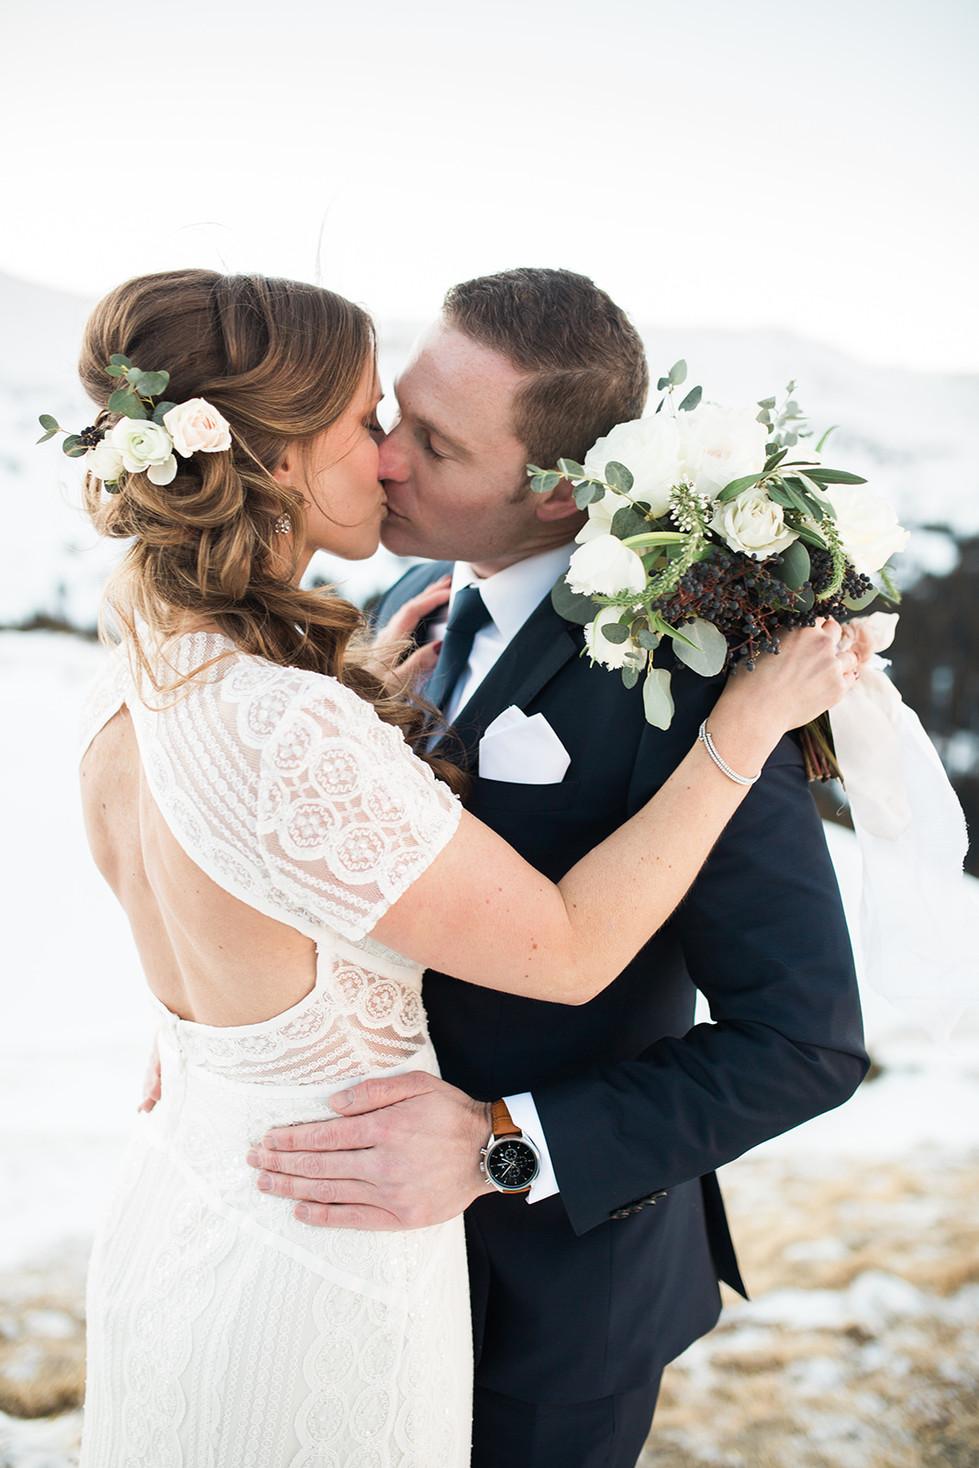 Samantha & Patrick- Beatrice & Woodsley, Denver - Intimate Wedding